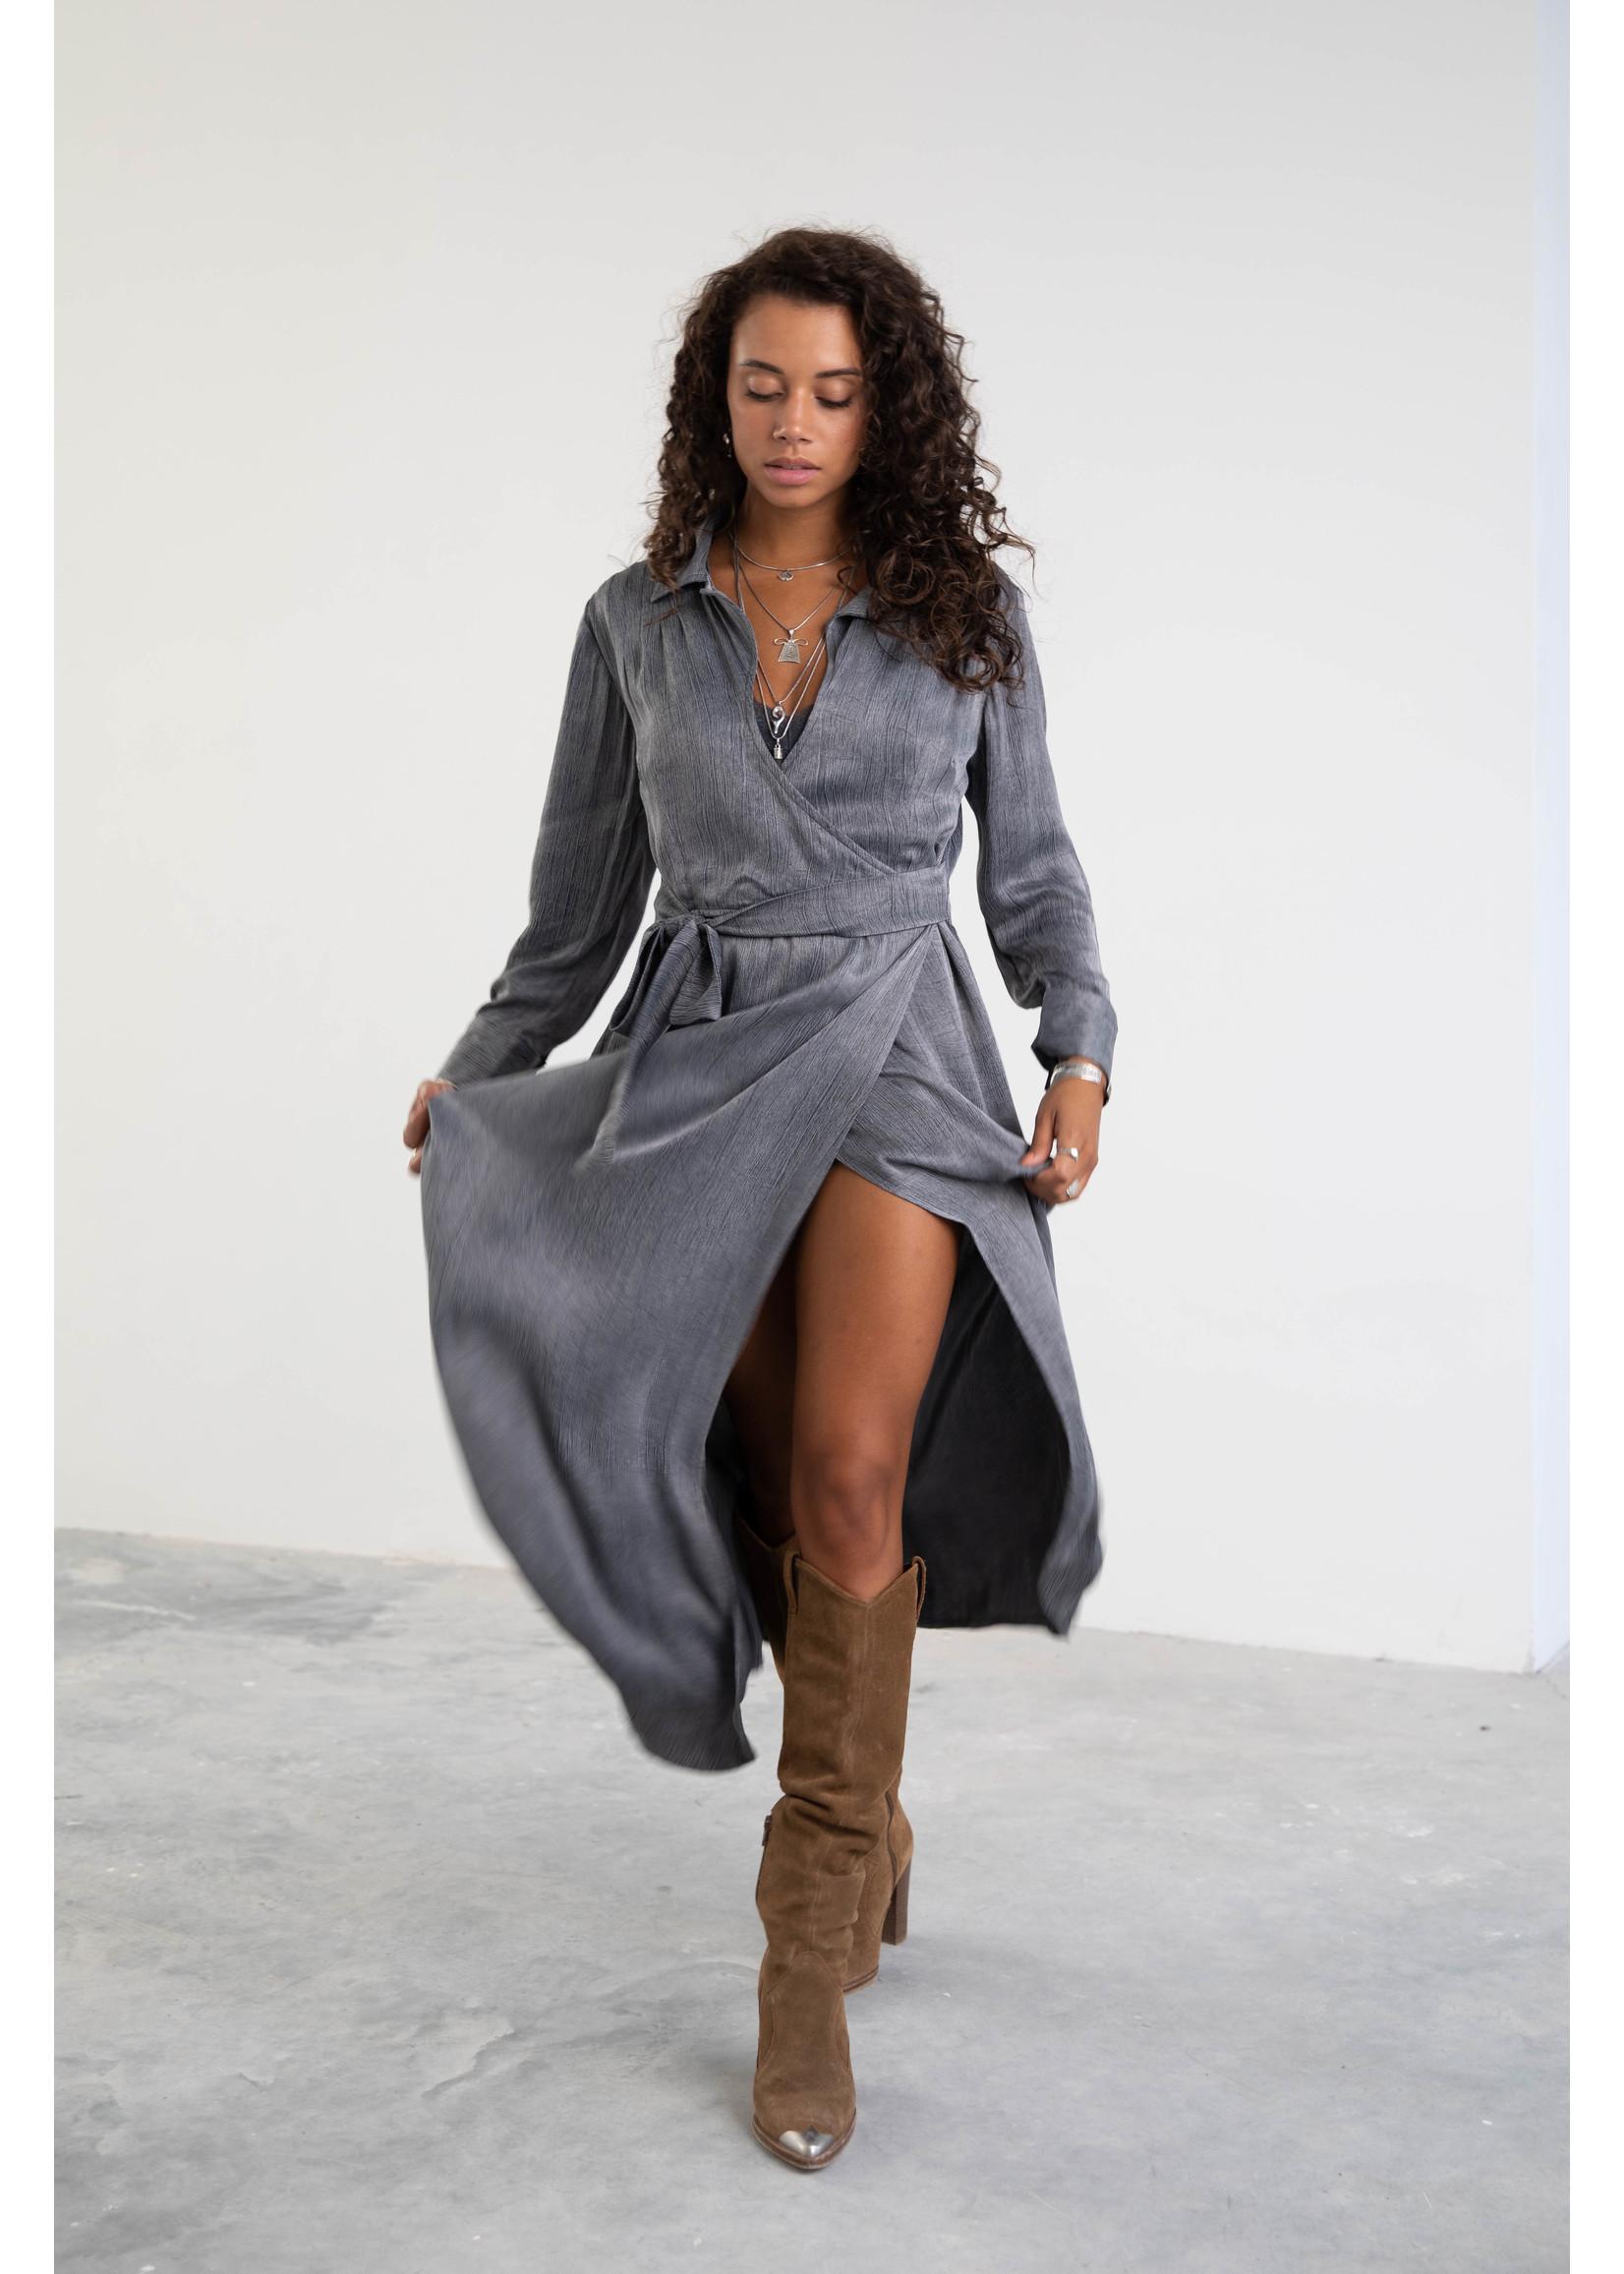 Moost Wanted Jade satin dress STONE GREY